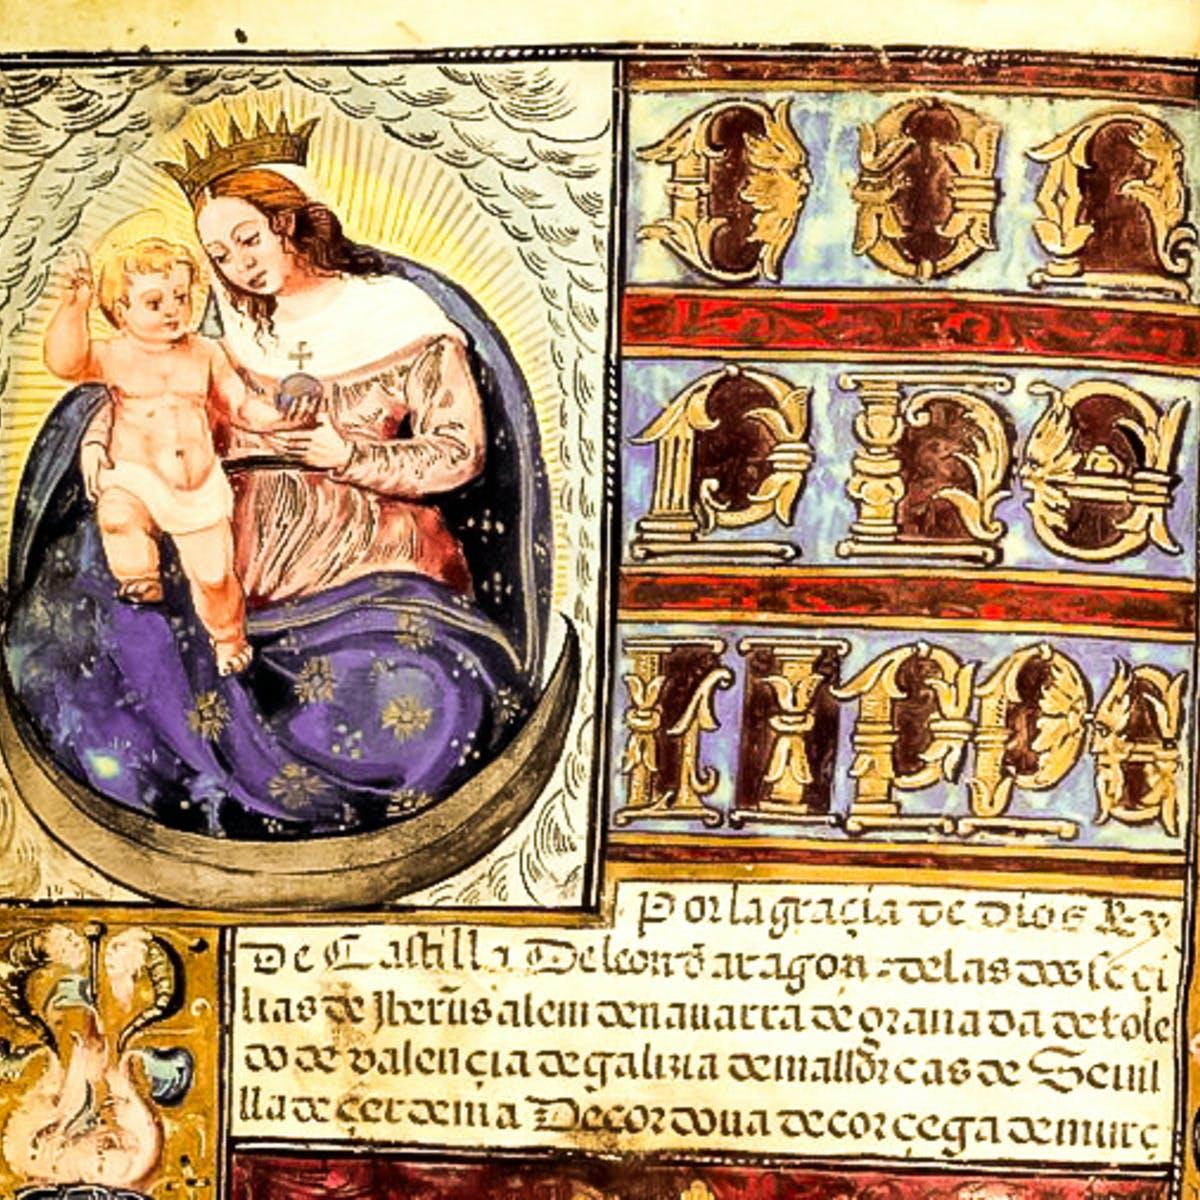 Deciphering Secrets: The Illuminated Manuscripts of Medieval Europe